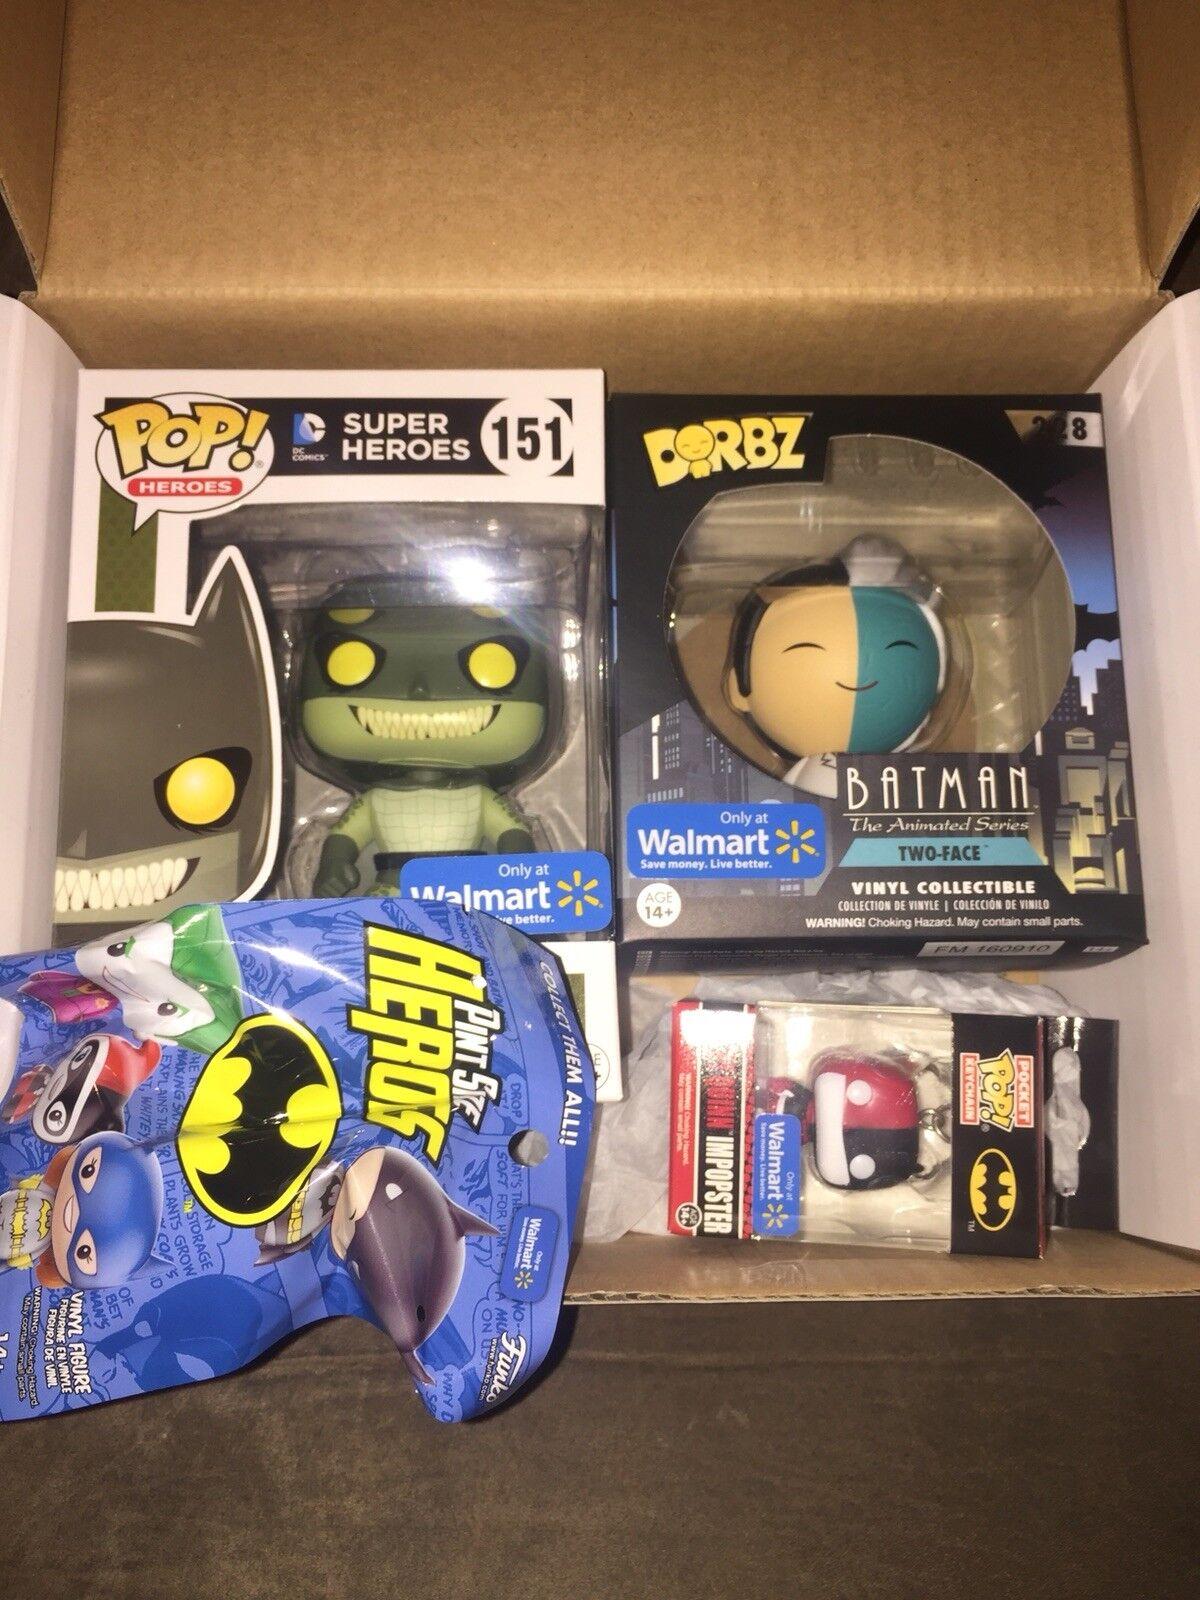 51bf9a4280a Funko Pop 2016 DC Walmart Black Friday Killer Croc Imposter Batman for sale  online